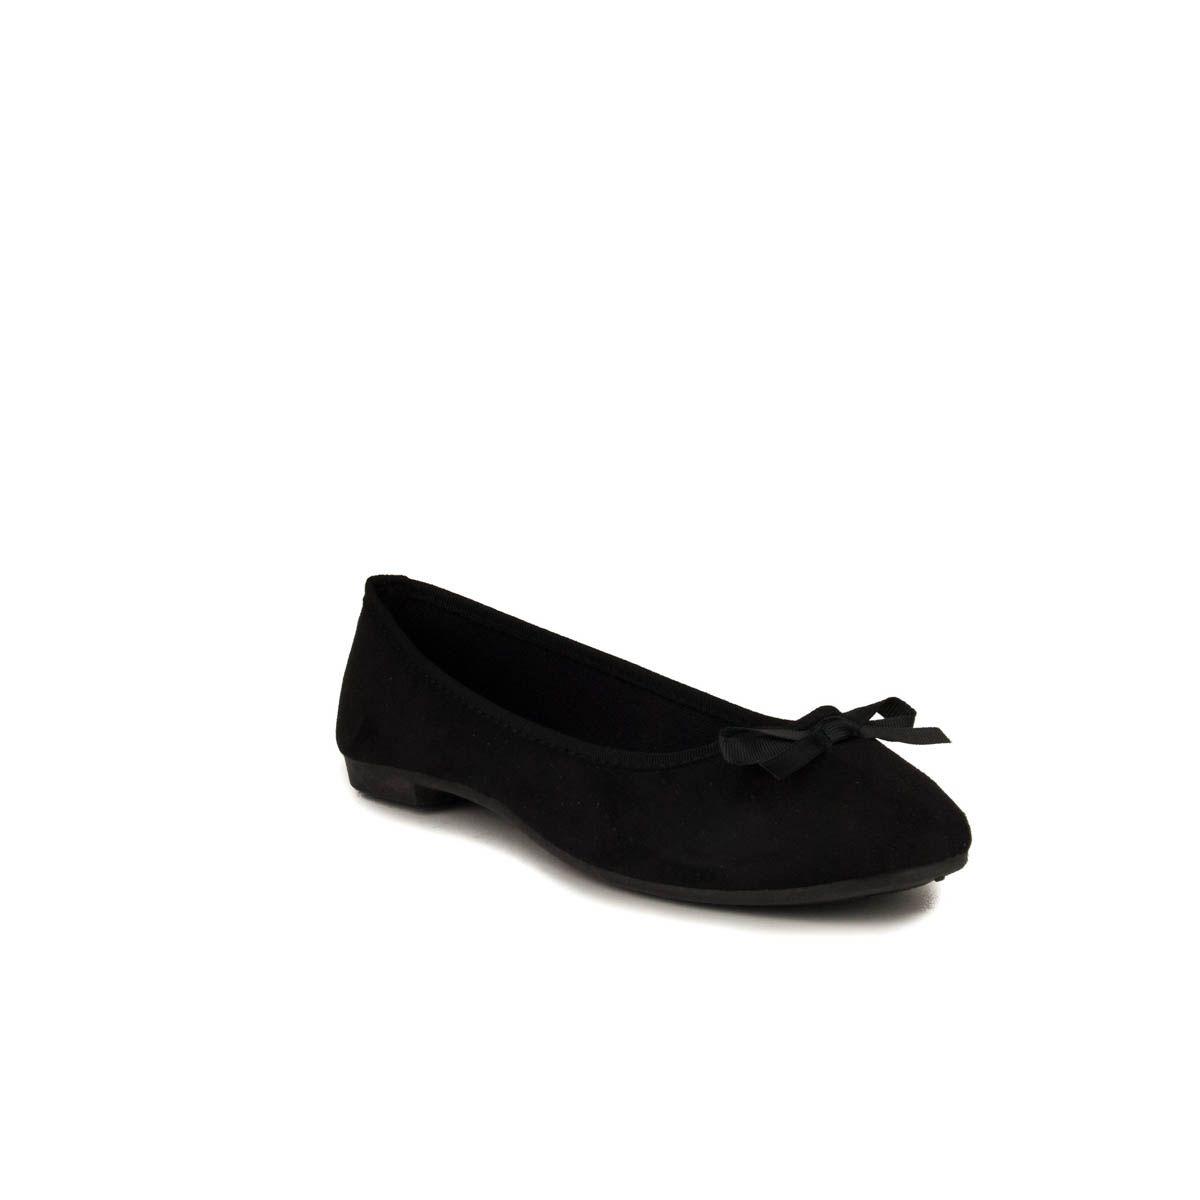 Montevita Ballet Flat in Black